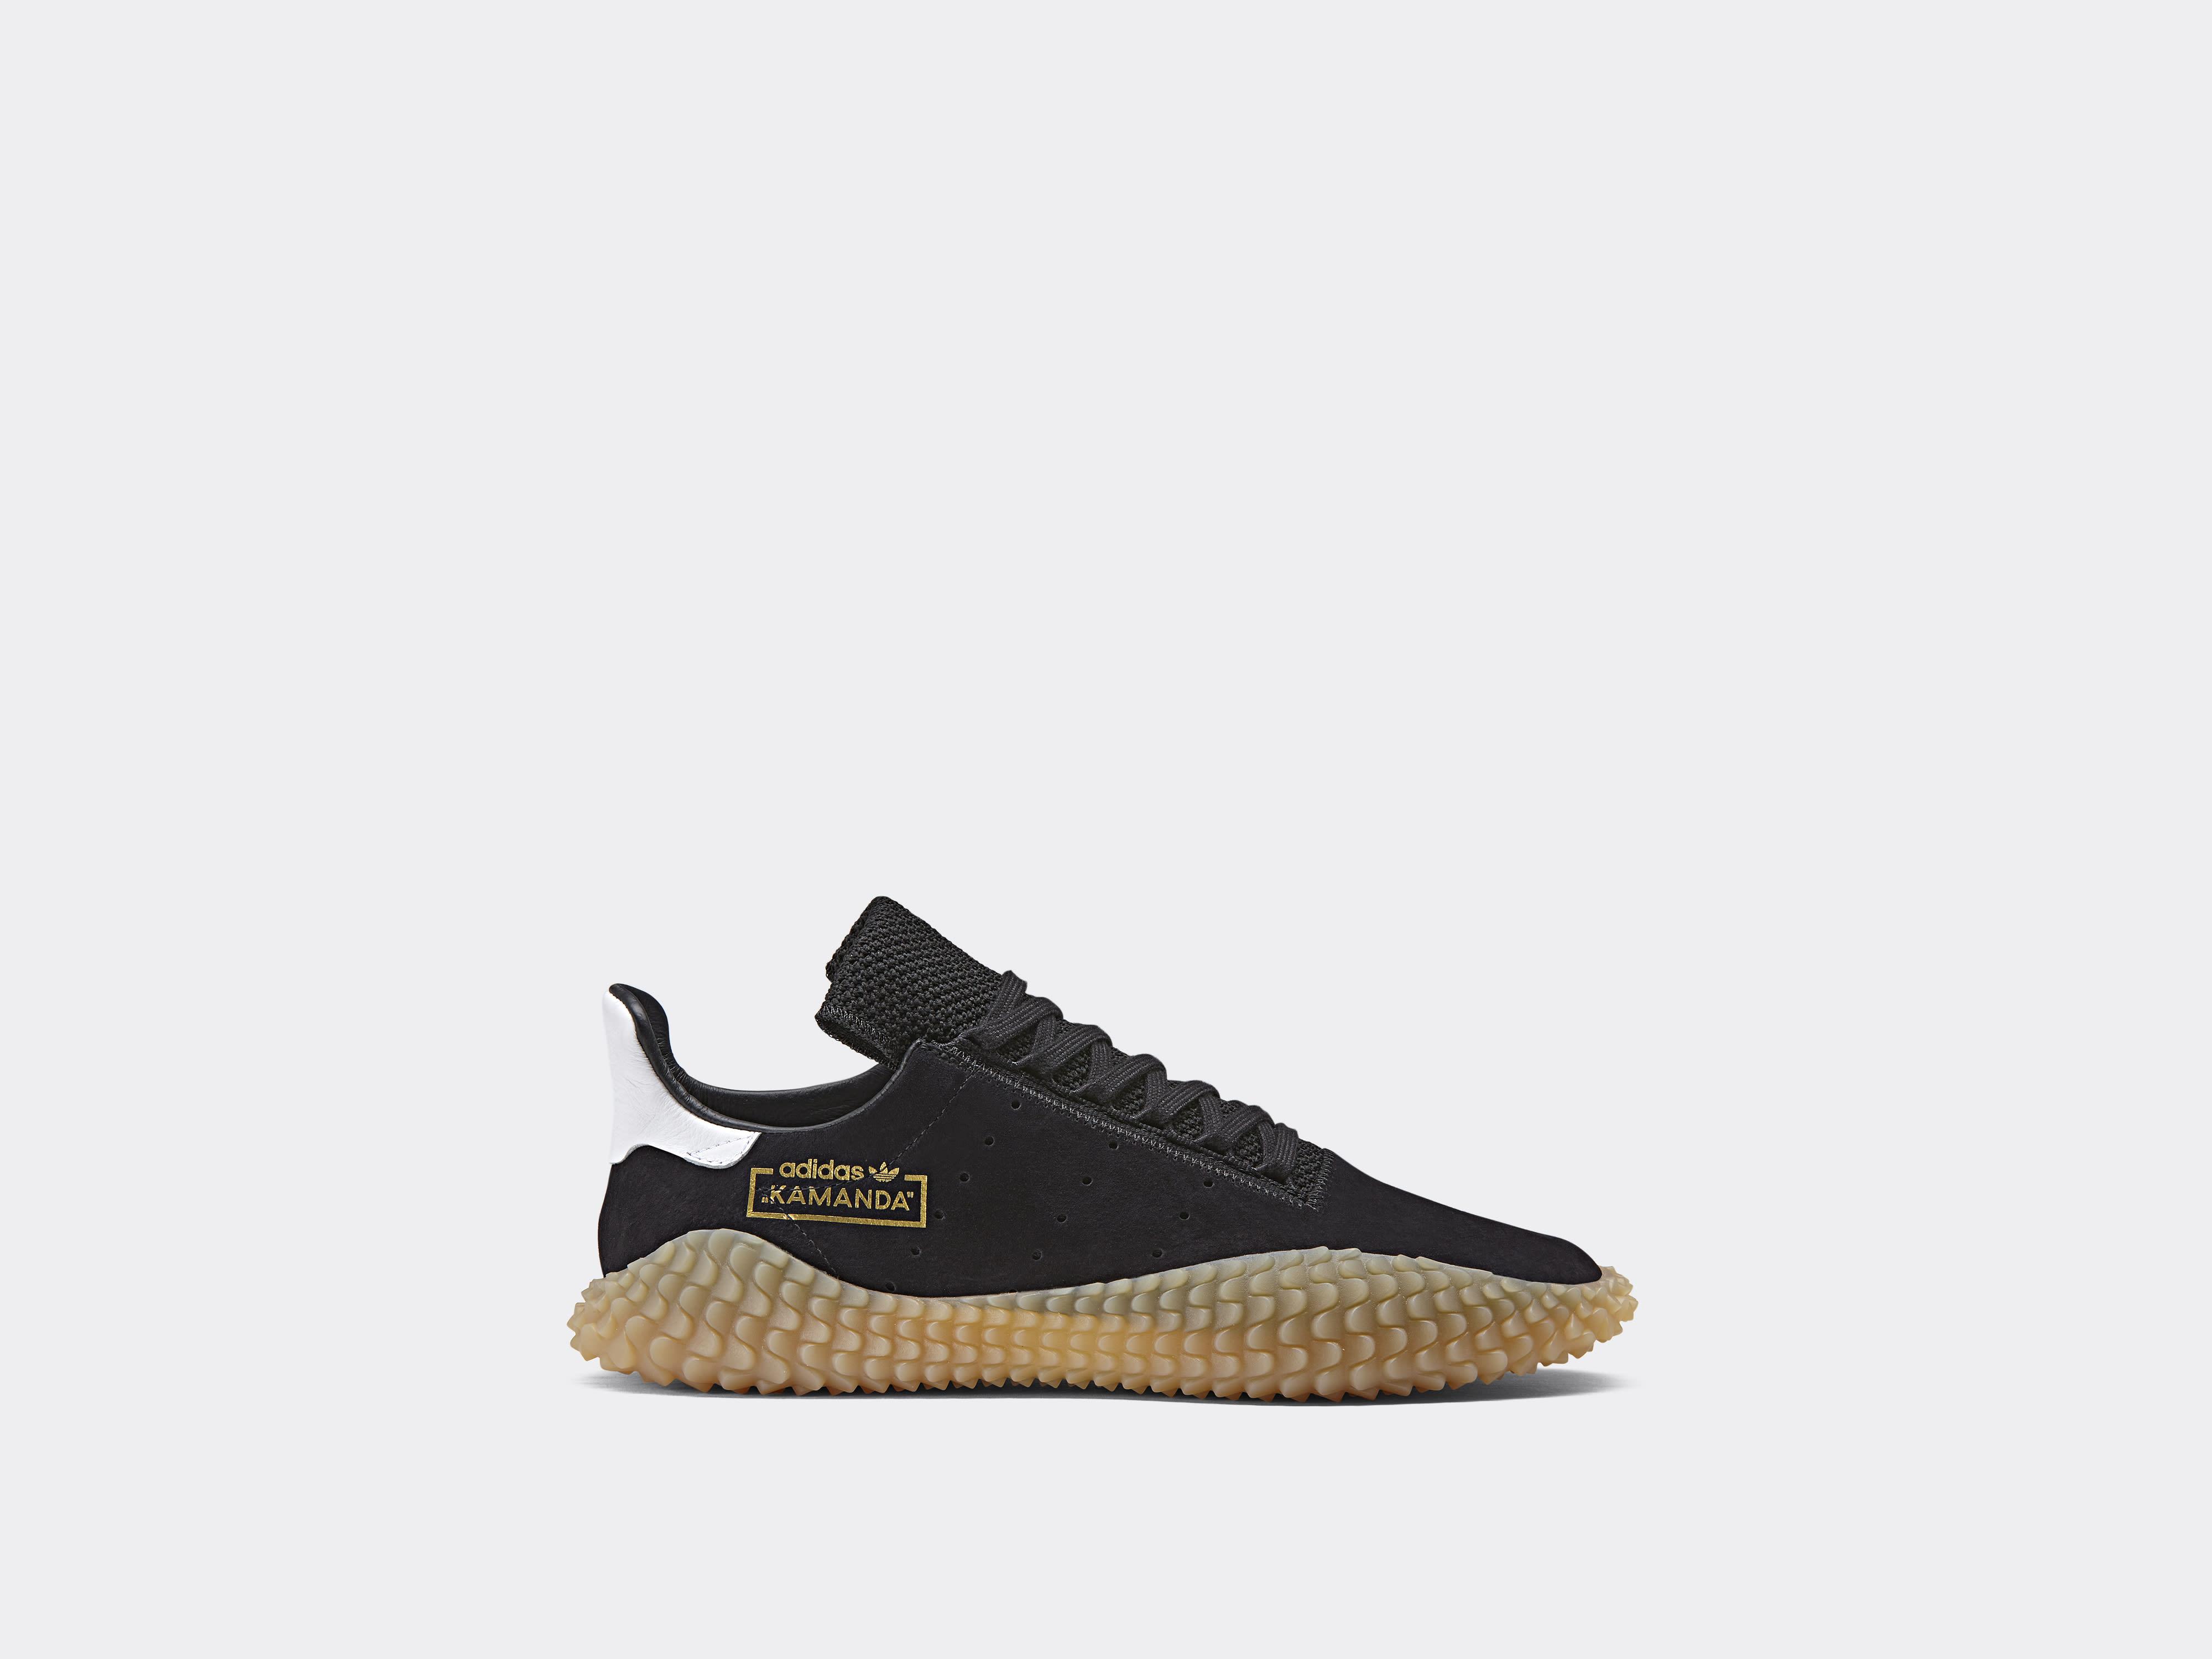 9e4835674 https   solecollector.com news 2018 04 sneaker-sales-april-20-2018 ...